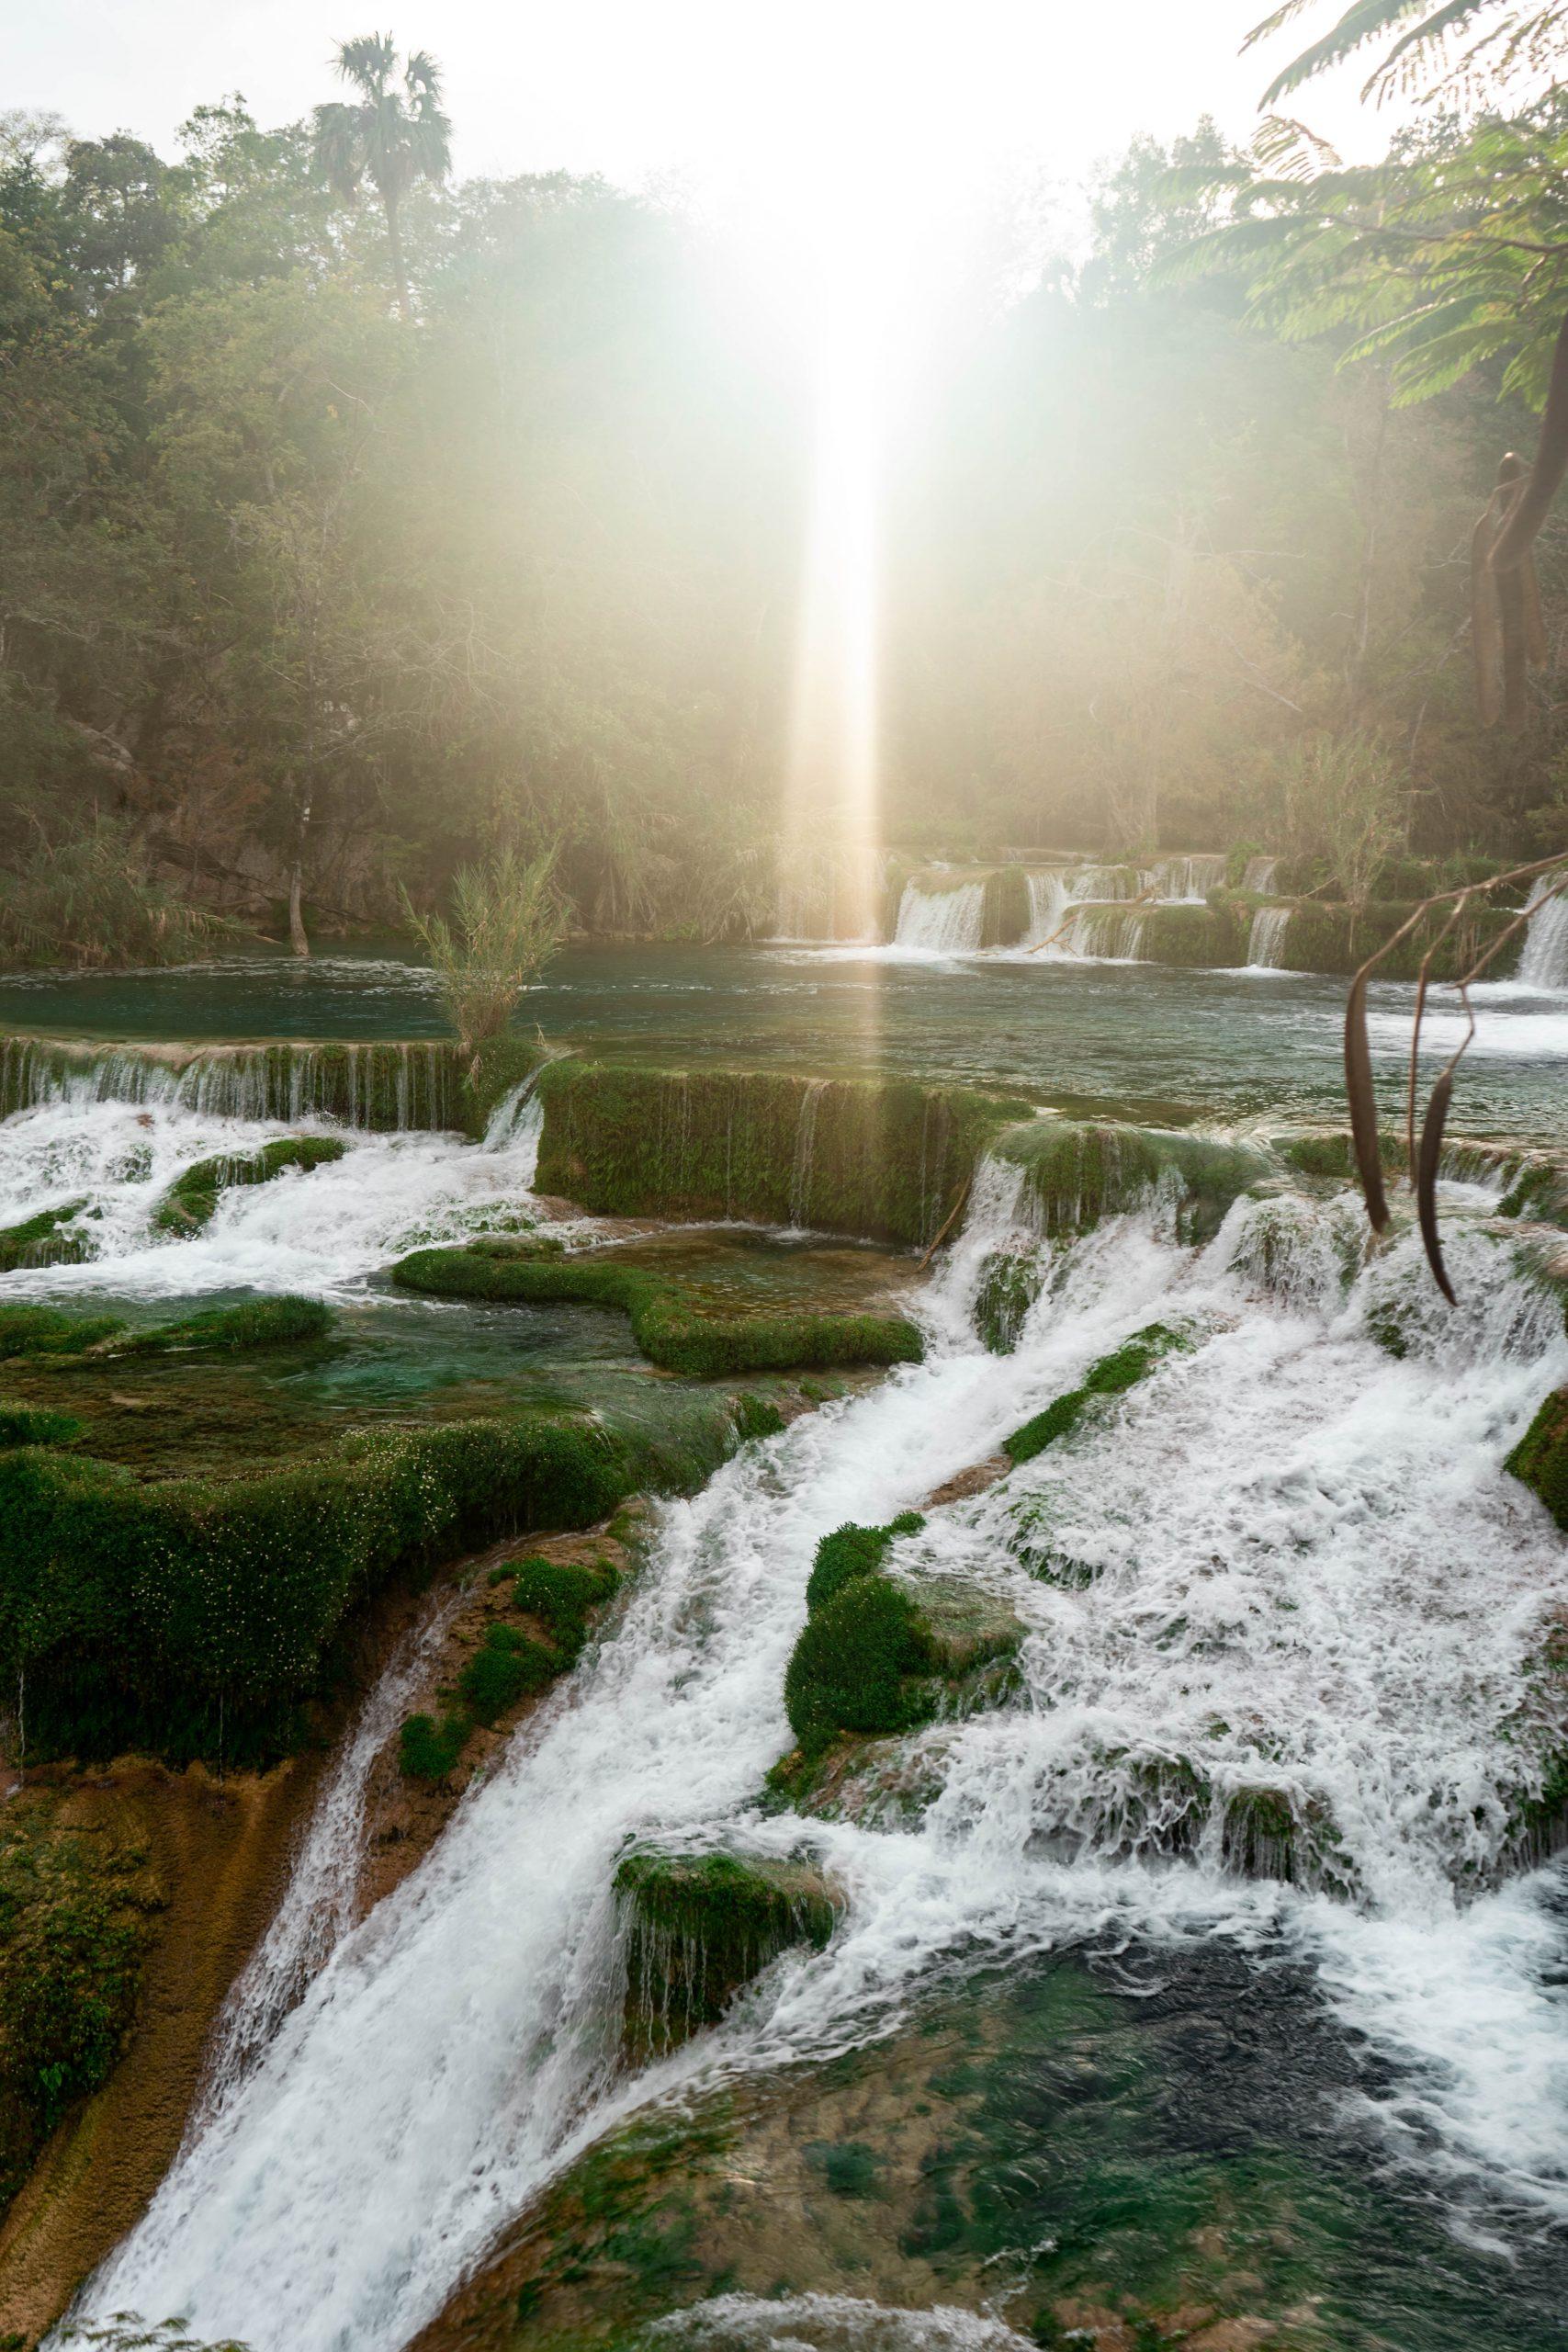 cascada el meco secret hidden waterfall la huasteca potosina san luis potosi mexico